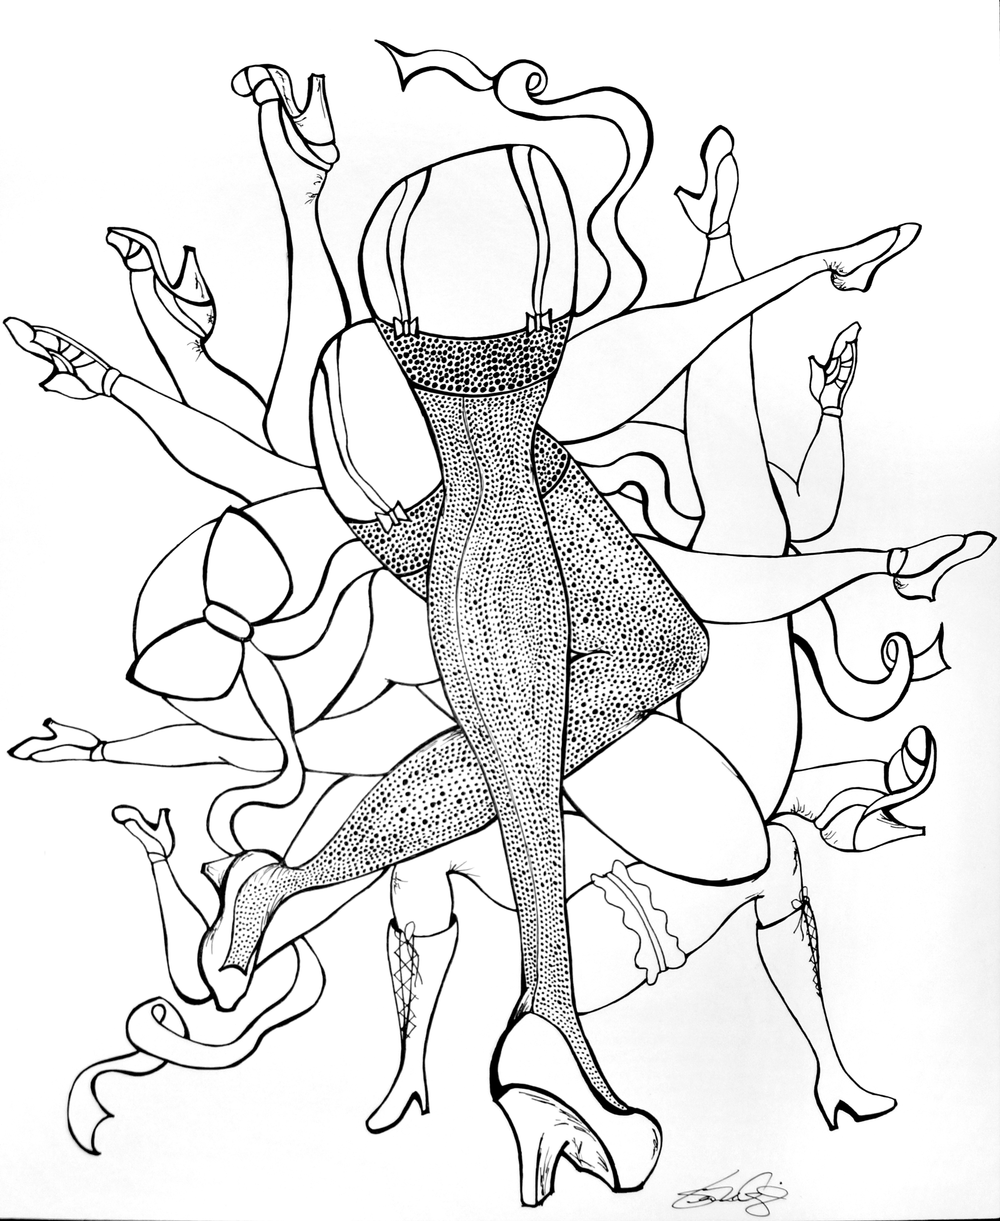 'the legs'